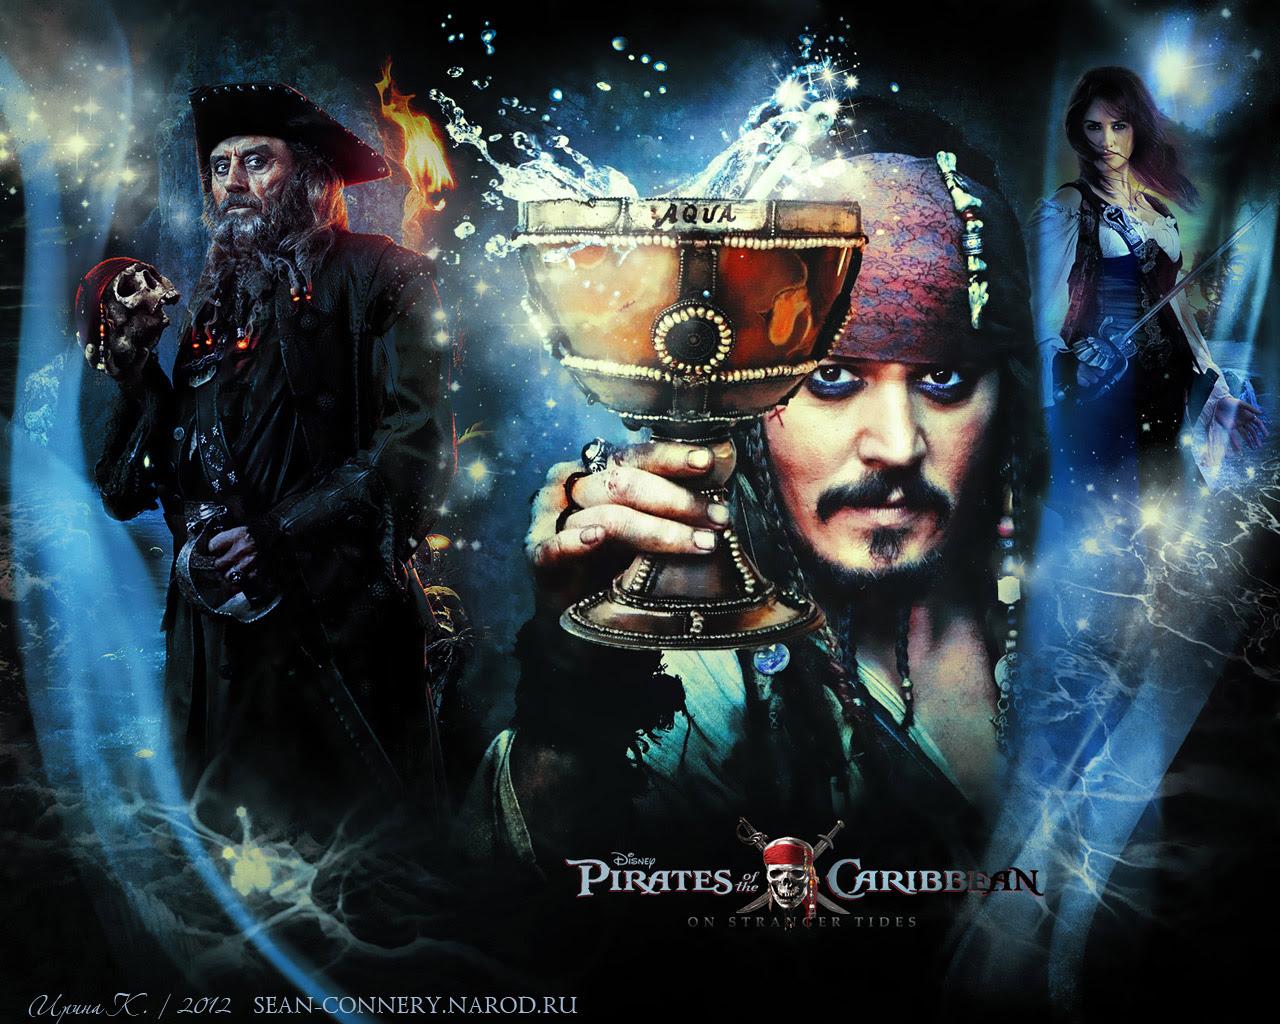 Jack Sparrow ジャック スパロウ 壁紙 32949252 ファンポップ